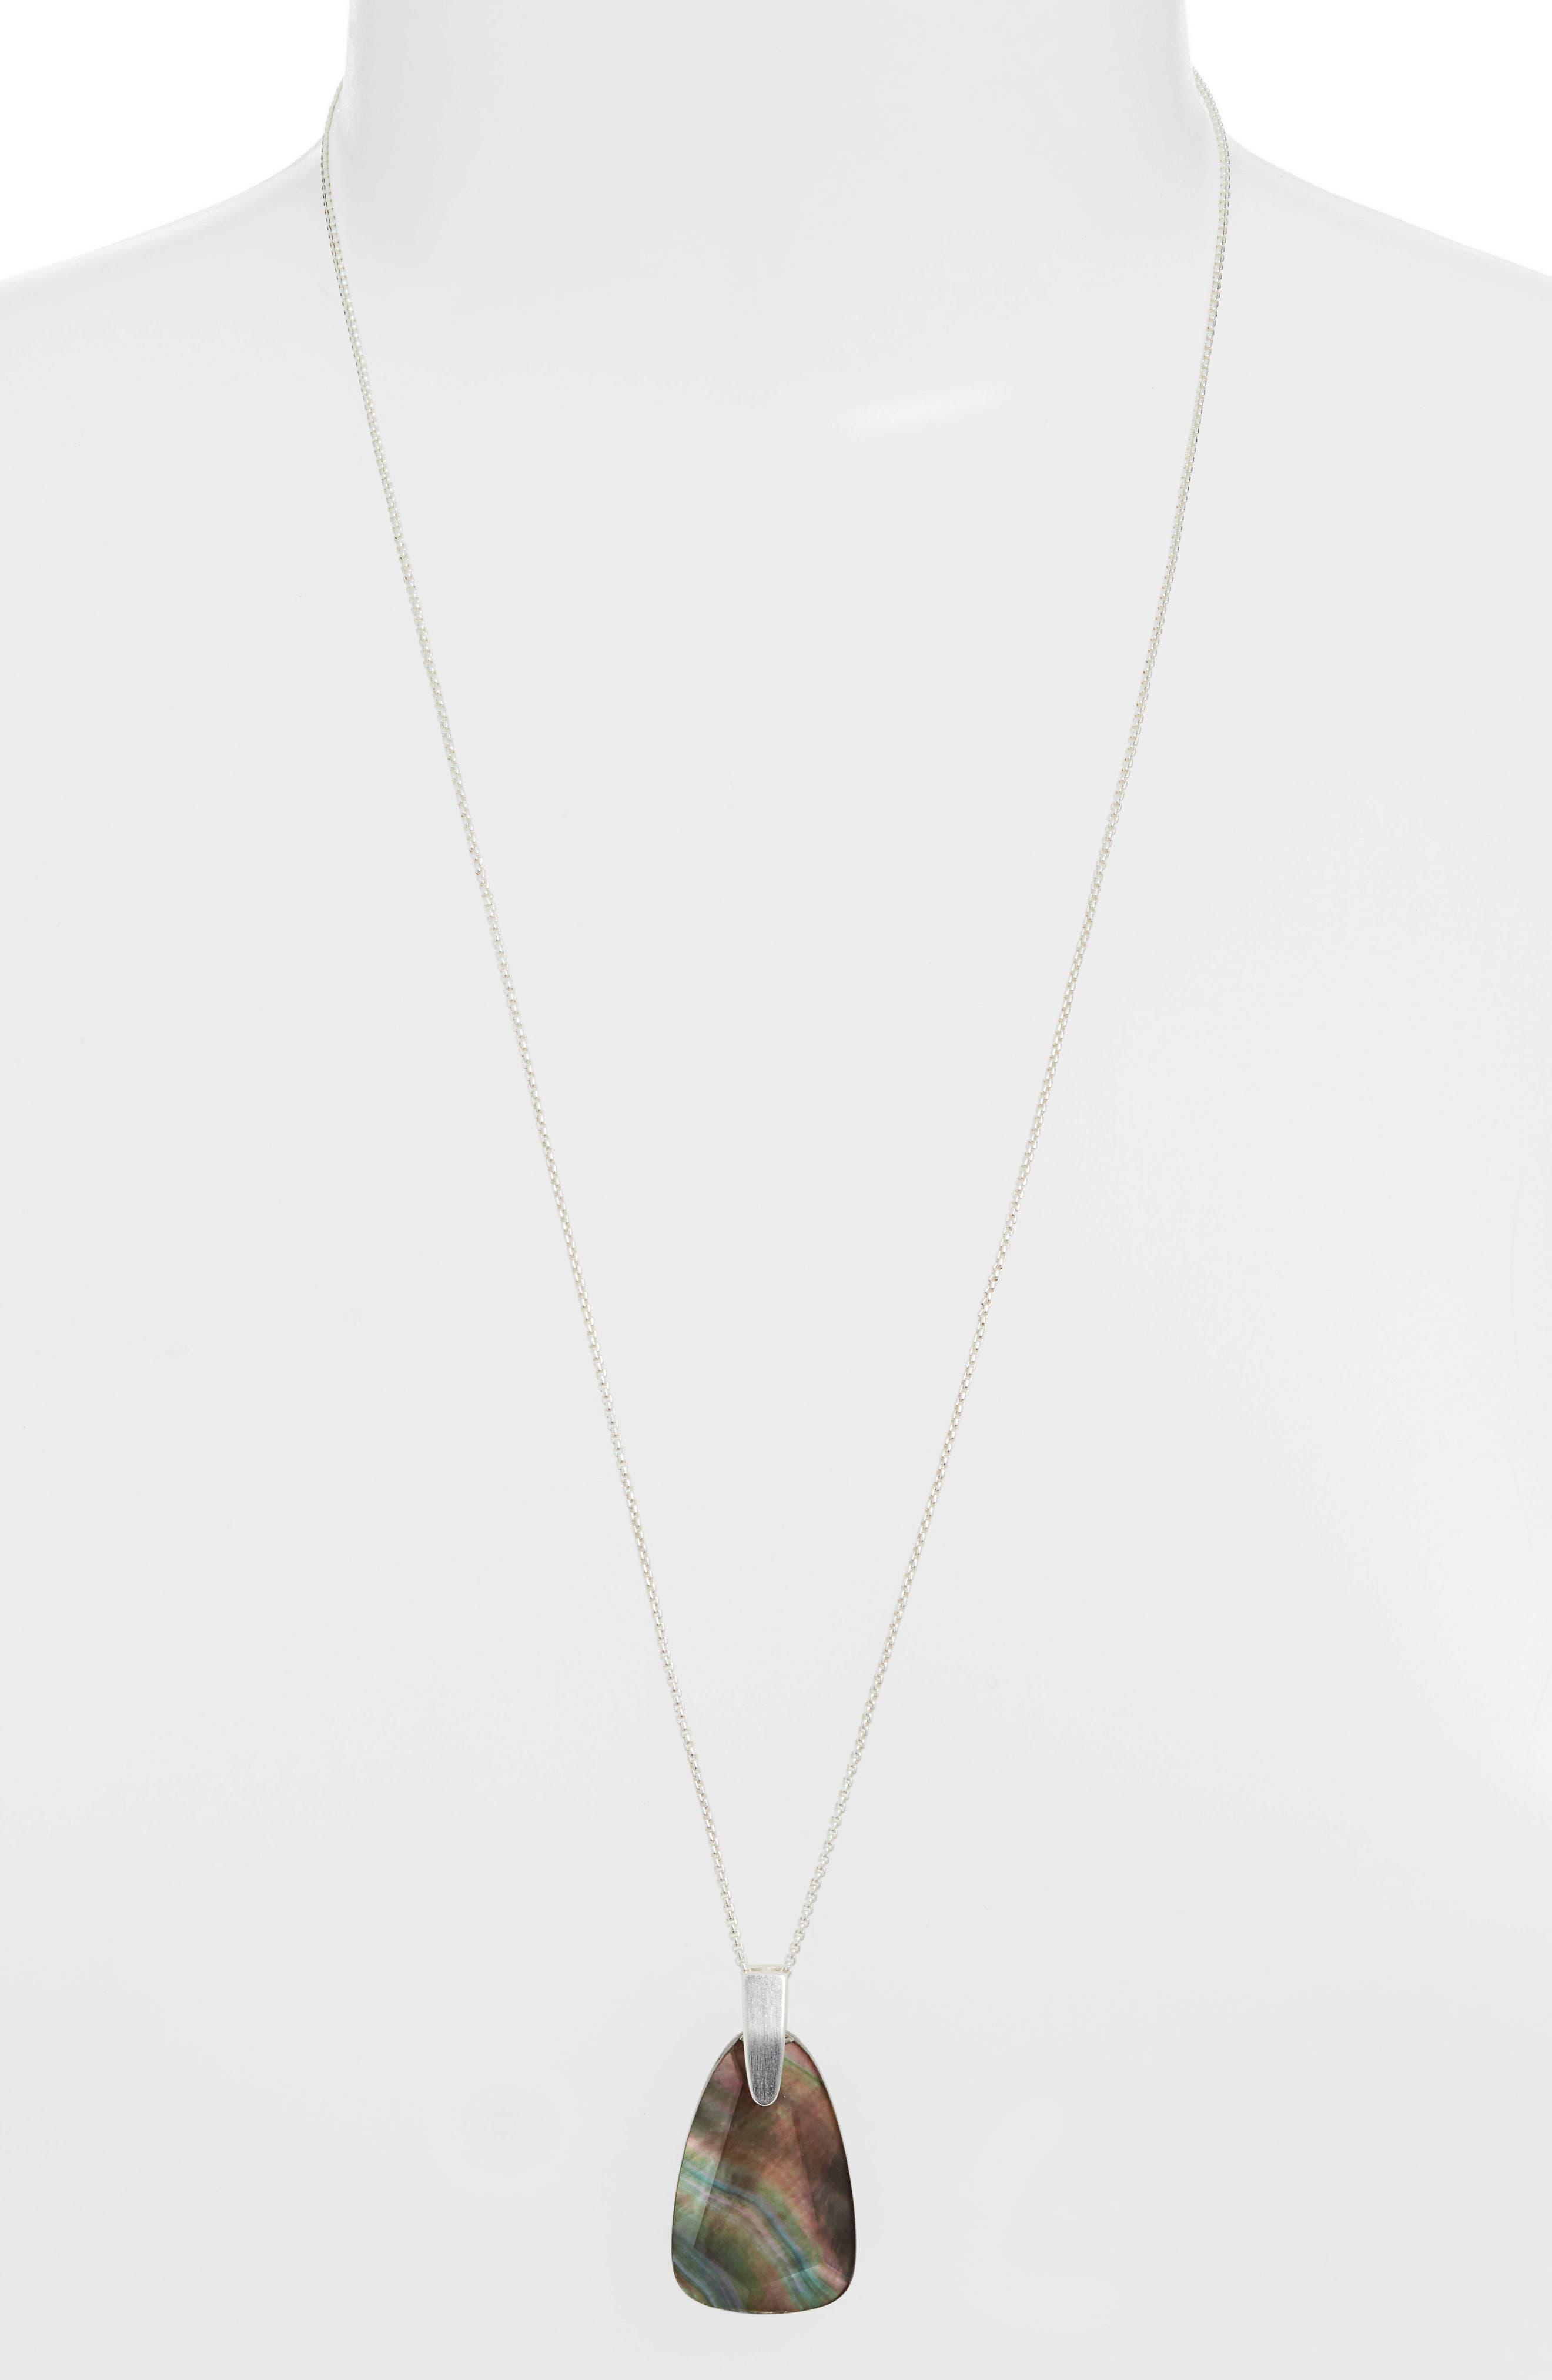 KENDRA SCOTT Maeve Long Stone Pendant Necklace, Main, color, BRIGHT SILVER/ BLACK MOP